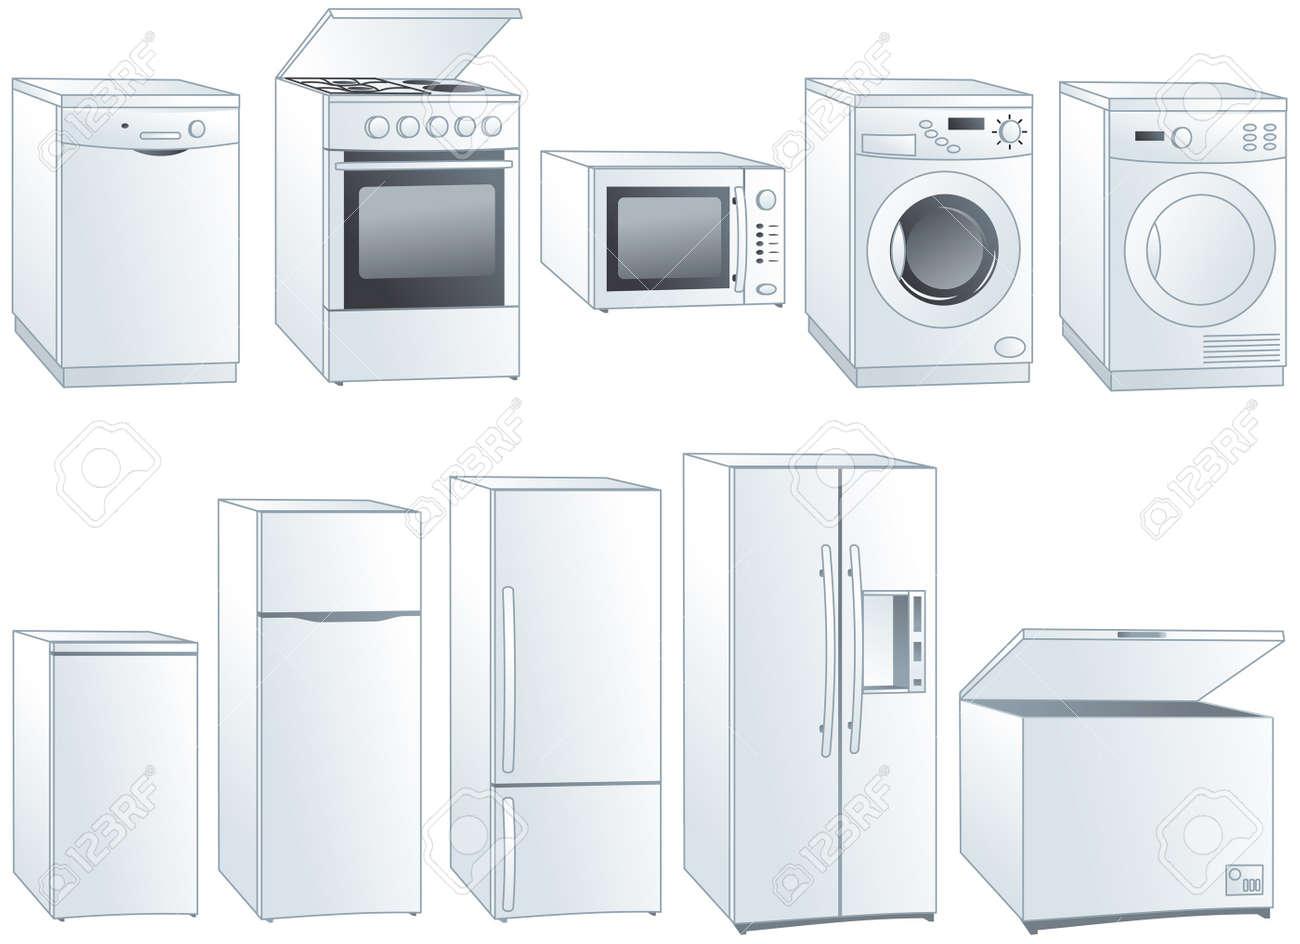 Kitchen home appliances: fridge, oven, stove, microwave, dishwasher, washing machine, dryer. - 18896084